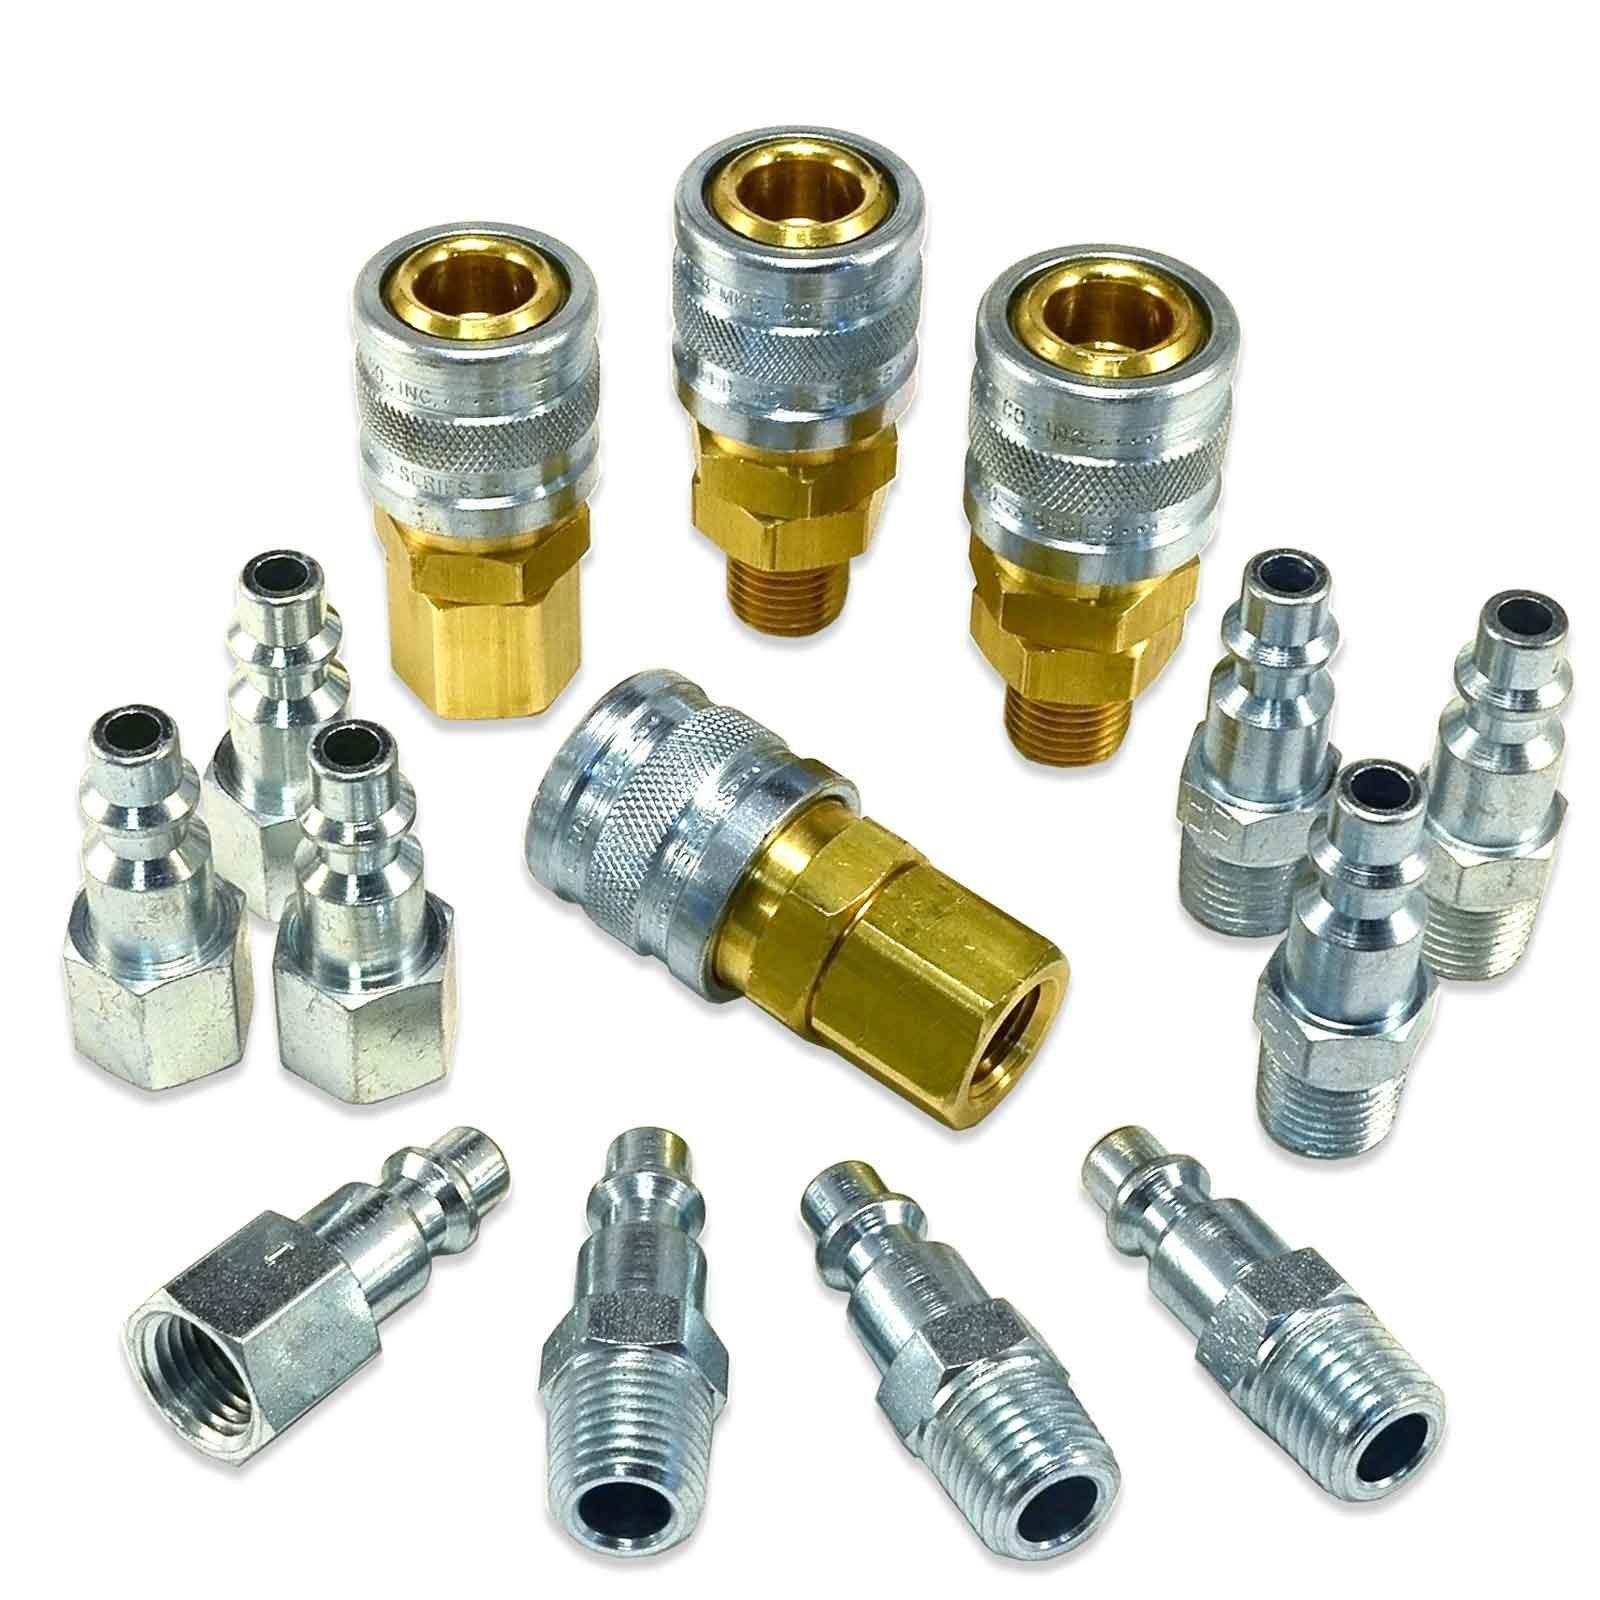 Foster 3 Series - 14pc Coupler & Plug Kit, 1/4'' Body, 1/4'' NPT - Industrial Interchange, I/M, MIL Spec